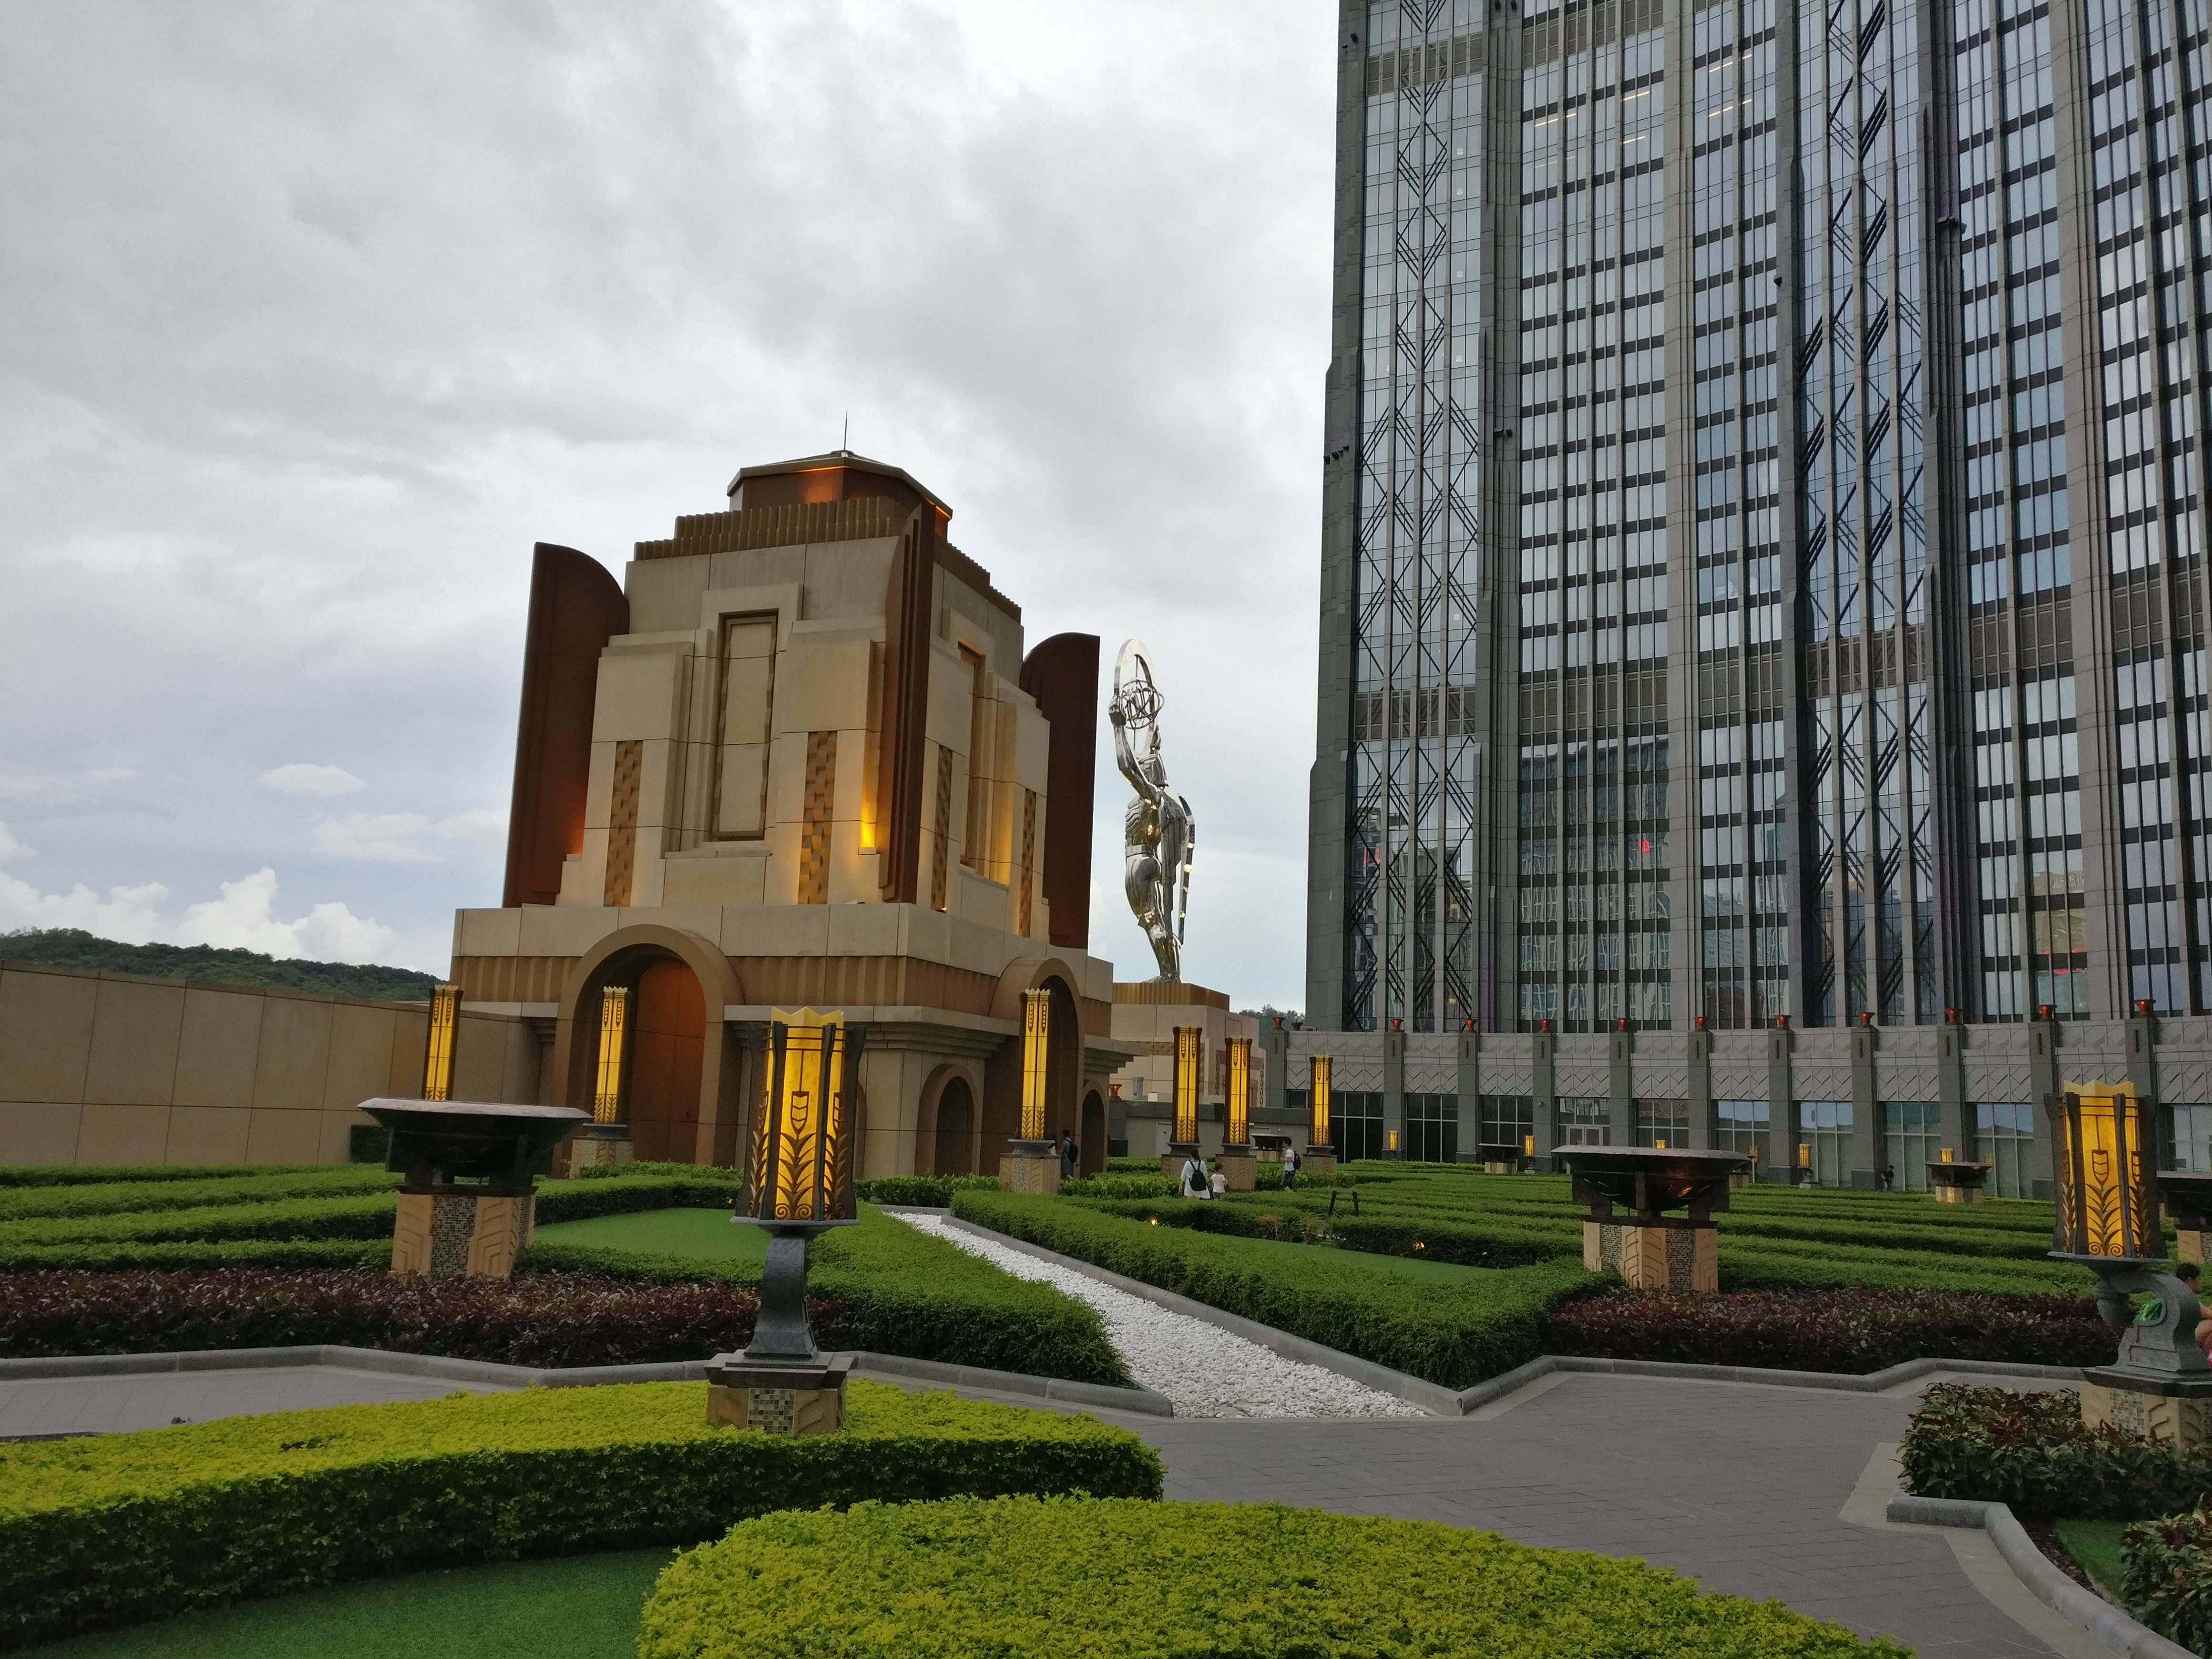 Macau: Am Casino mit dem Riesenrad